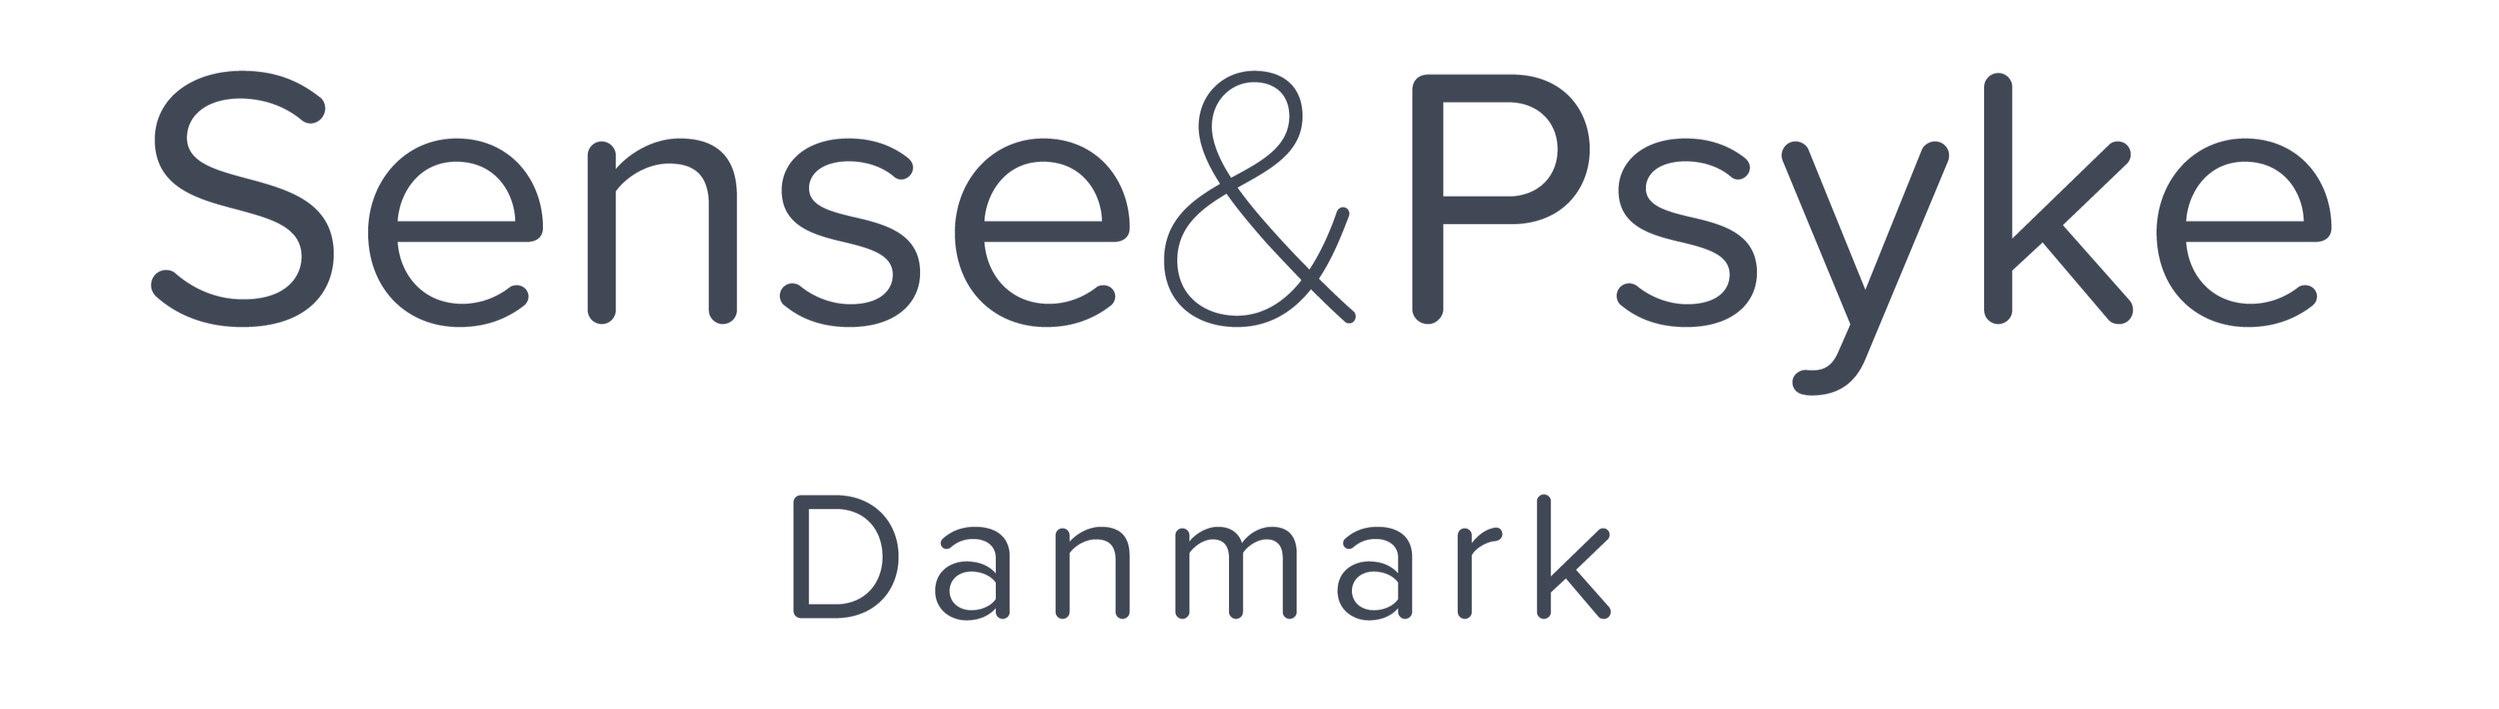 Sense+%26+Psyke+Danmark.jpg